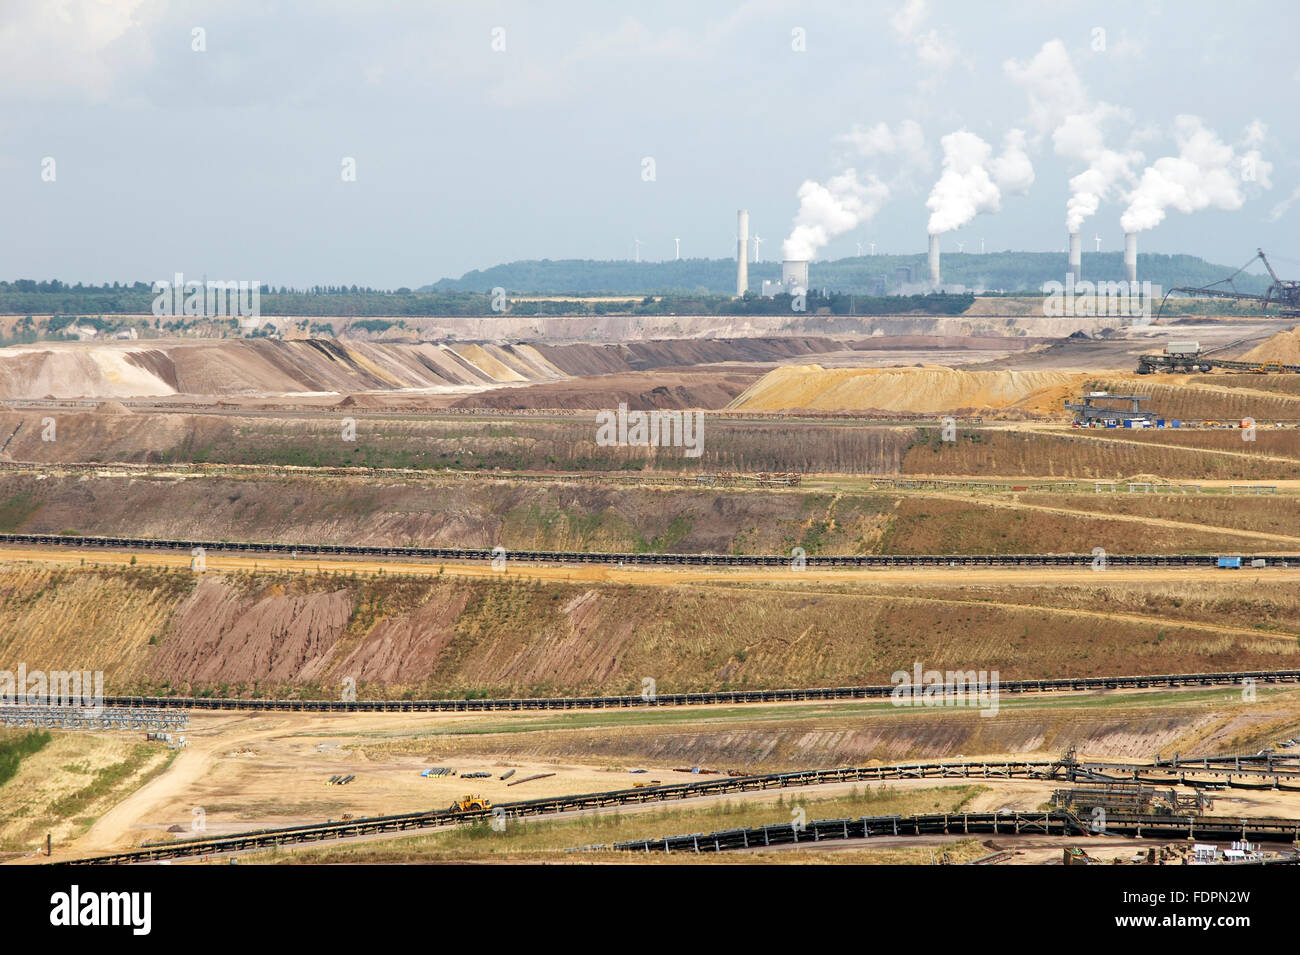 industry,opencast,garzweiler,mining - Stock Image